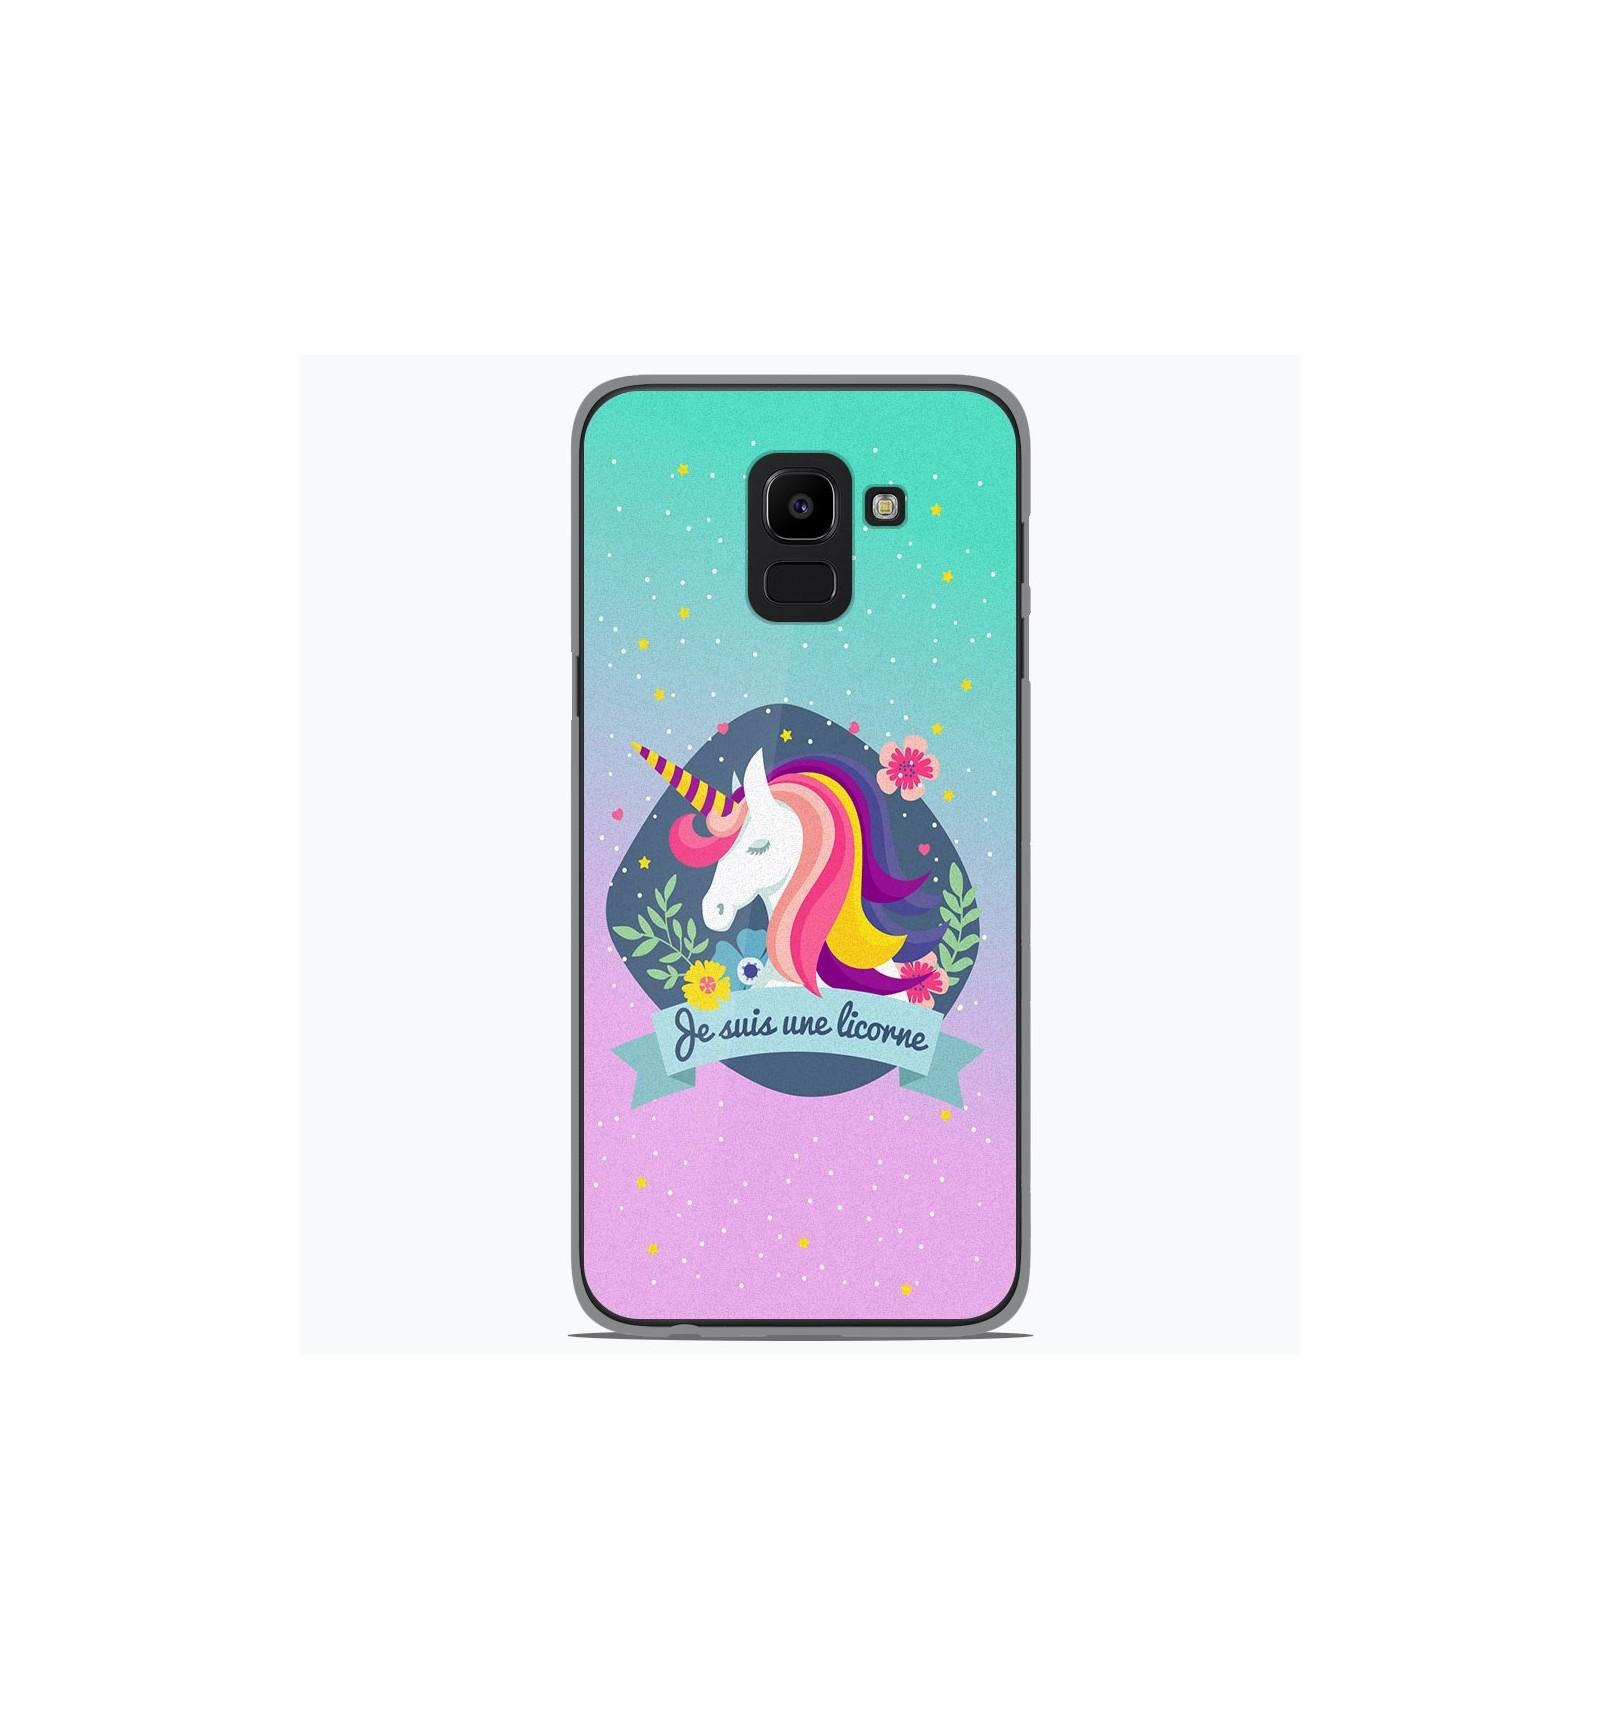 coque galaxy j6plus 2018